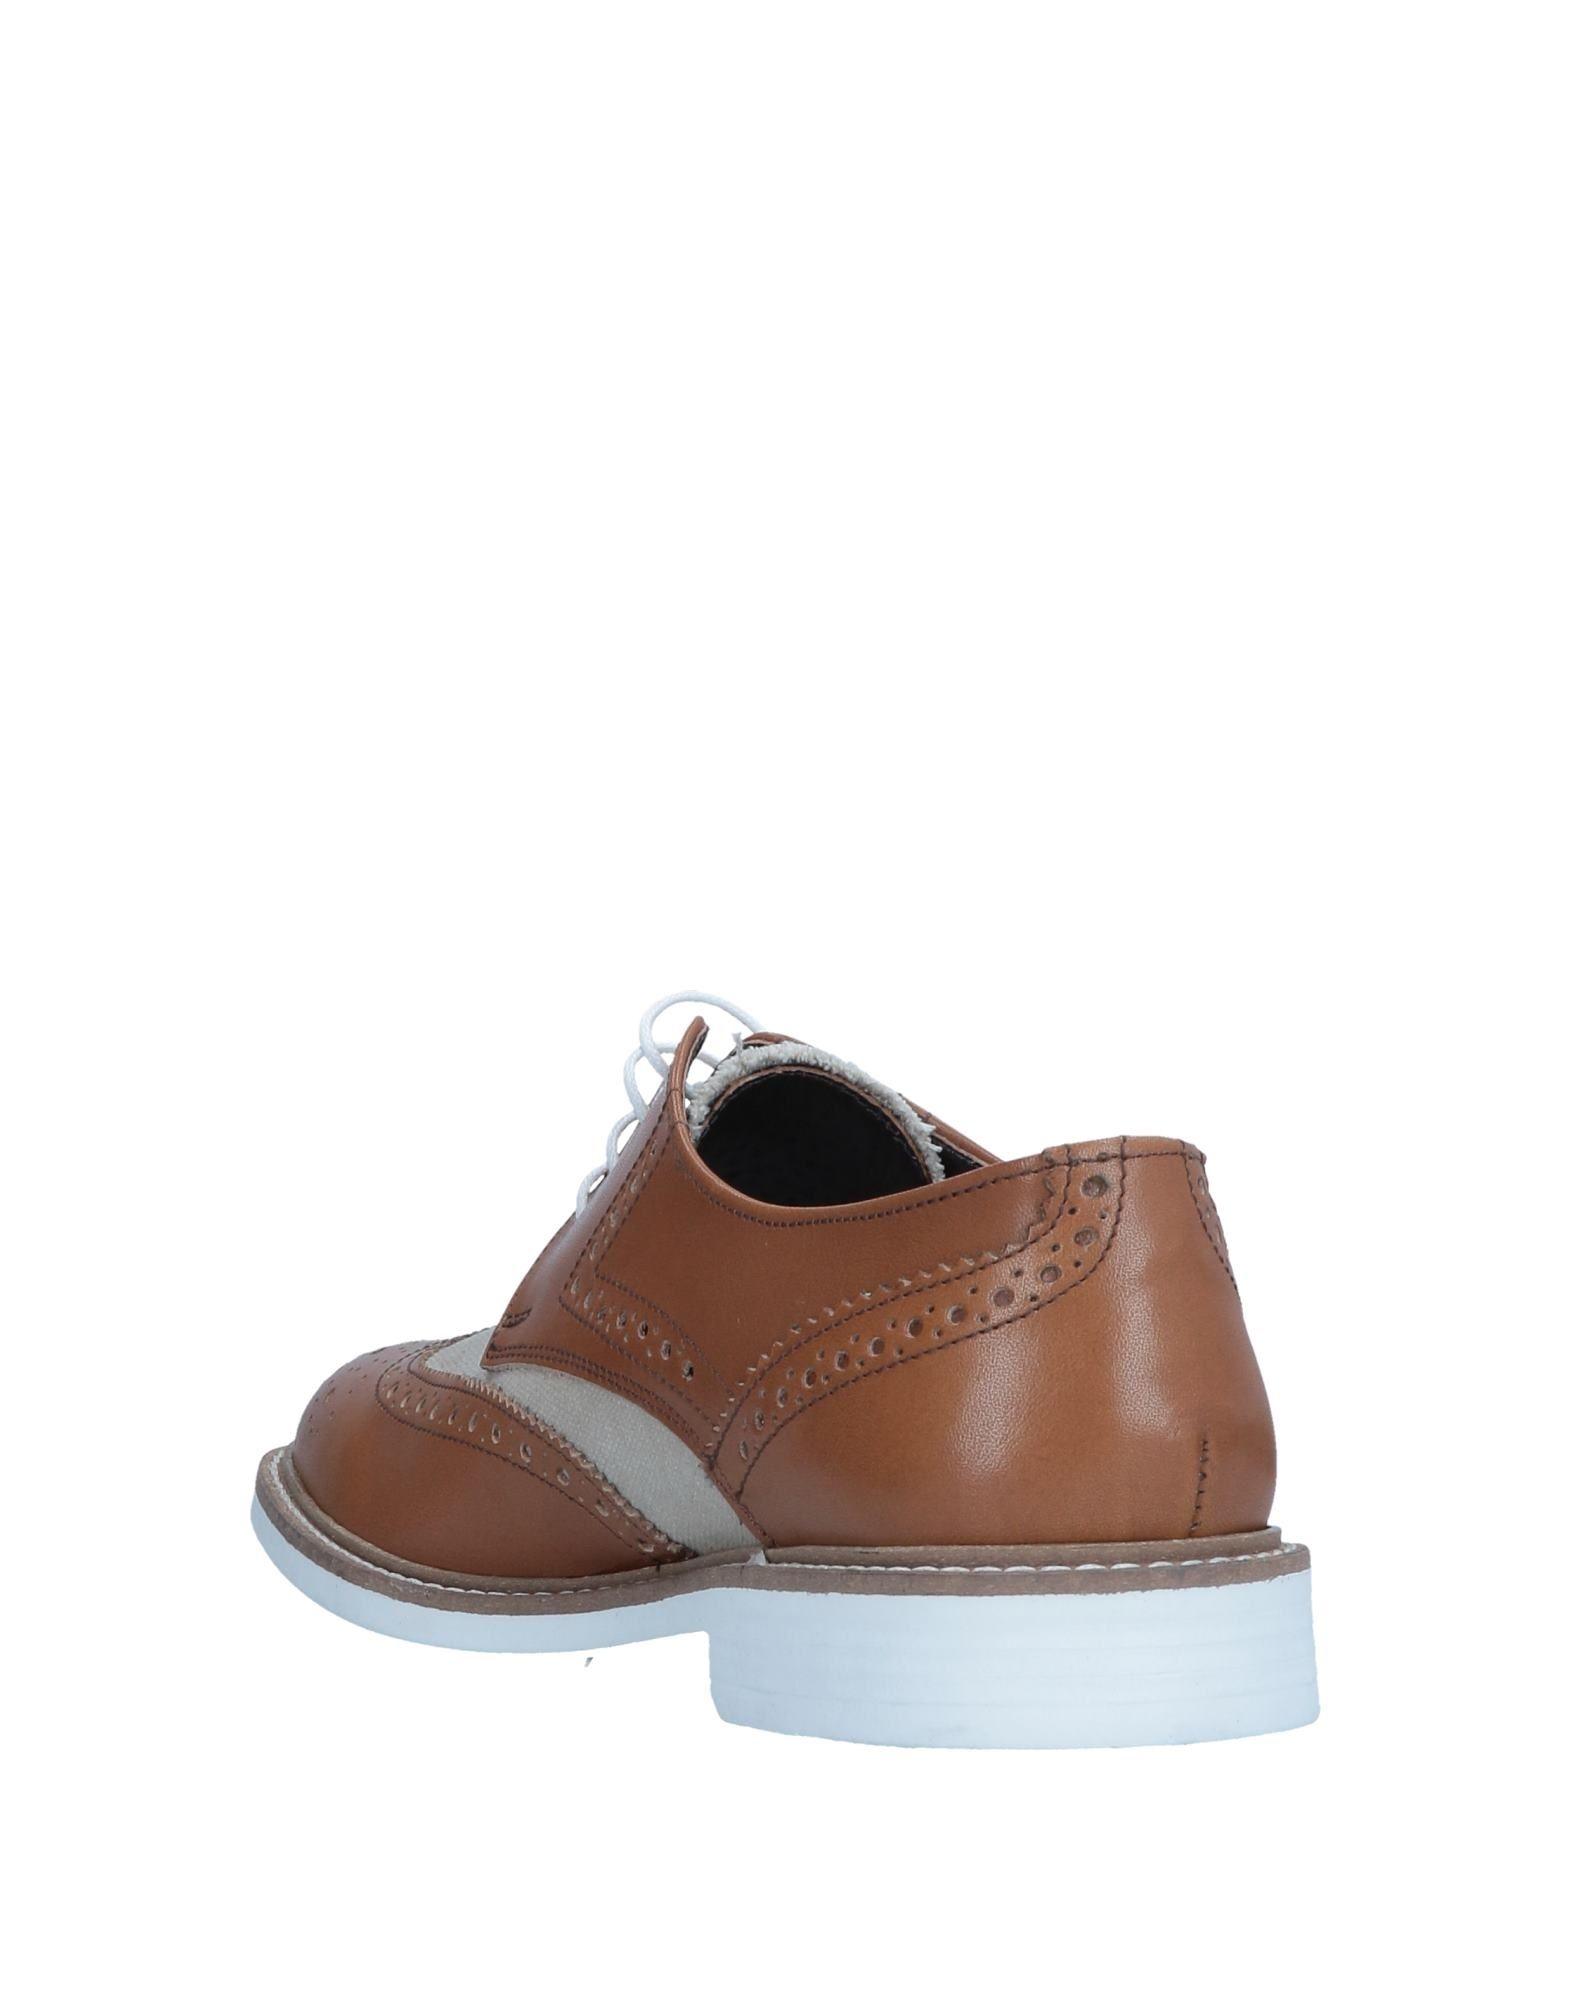 Cristiano 11557639II Rossani® Schnürschuhe Herren  11557639II Cristiano Gute Qualität beliebte Schuhe 79eb5b